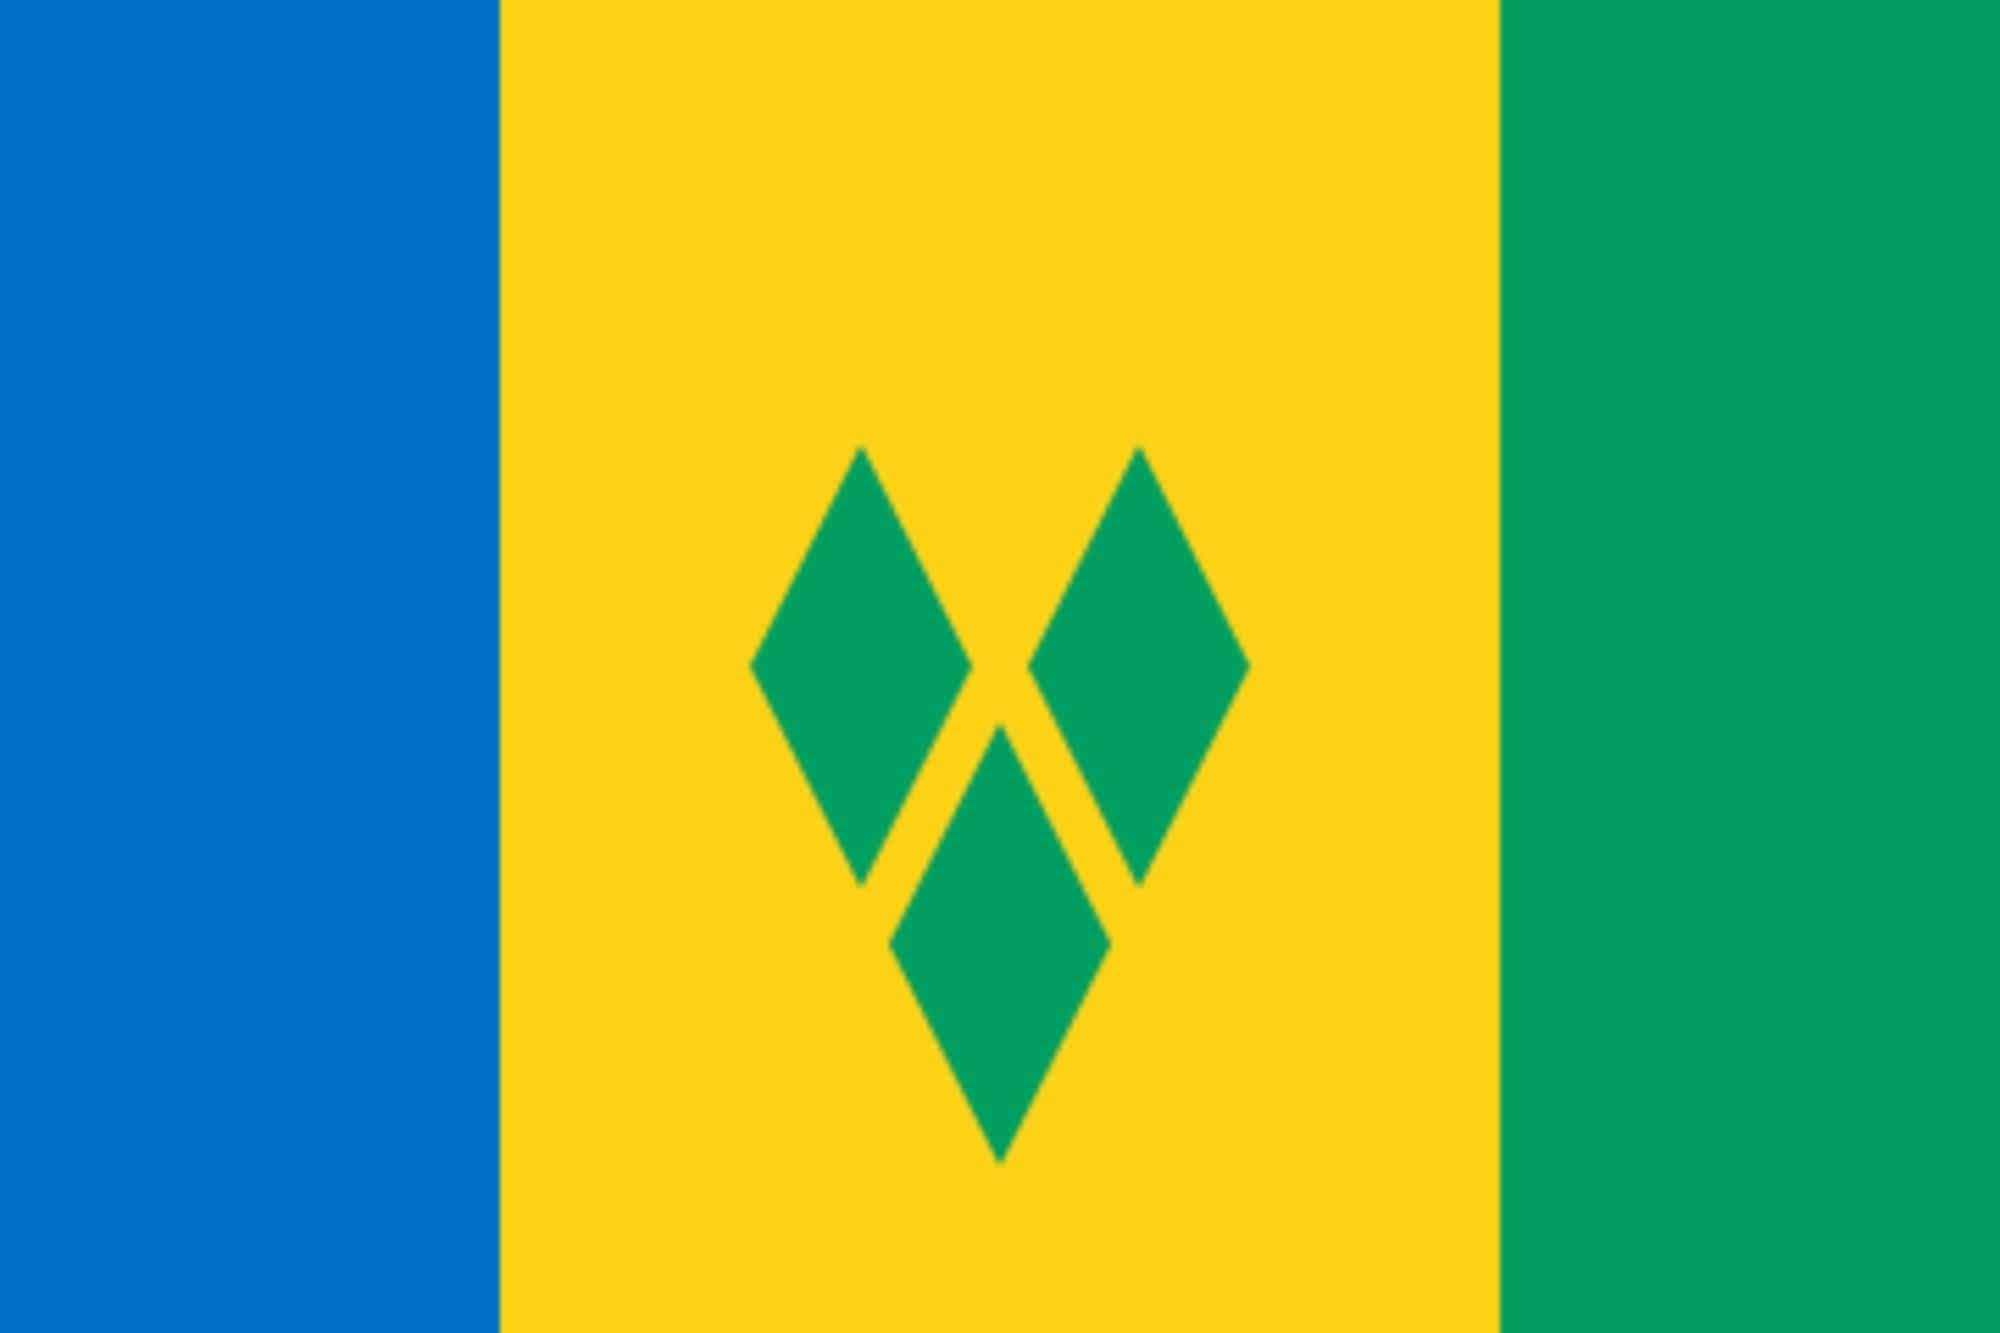 सेंट विंसेंट एंड ग्रेनाडाइन्स Saint Vincent and the Grenadines